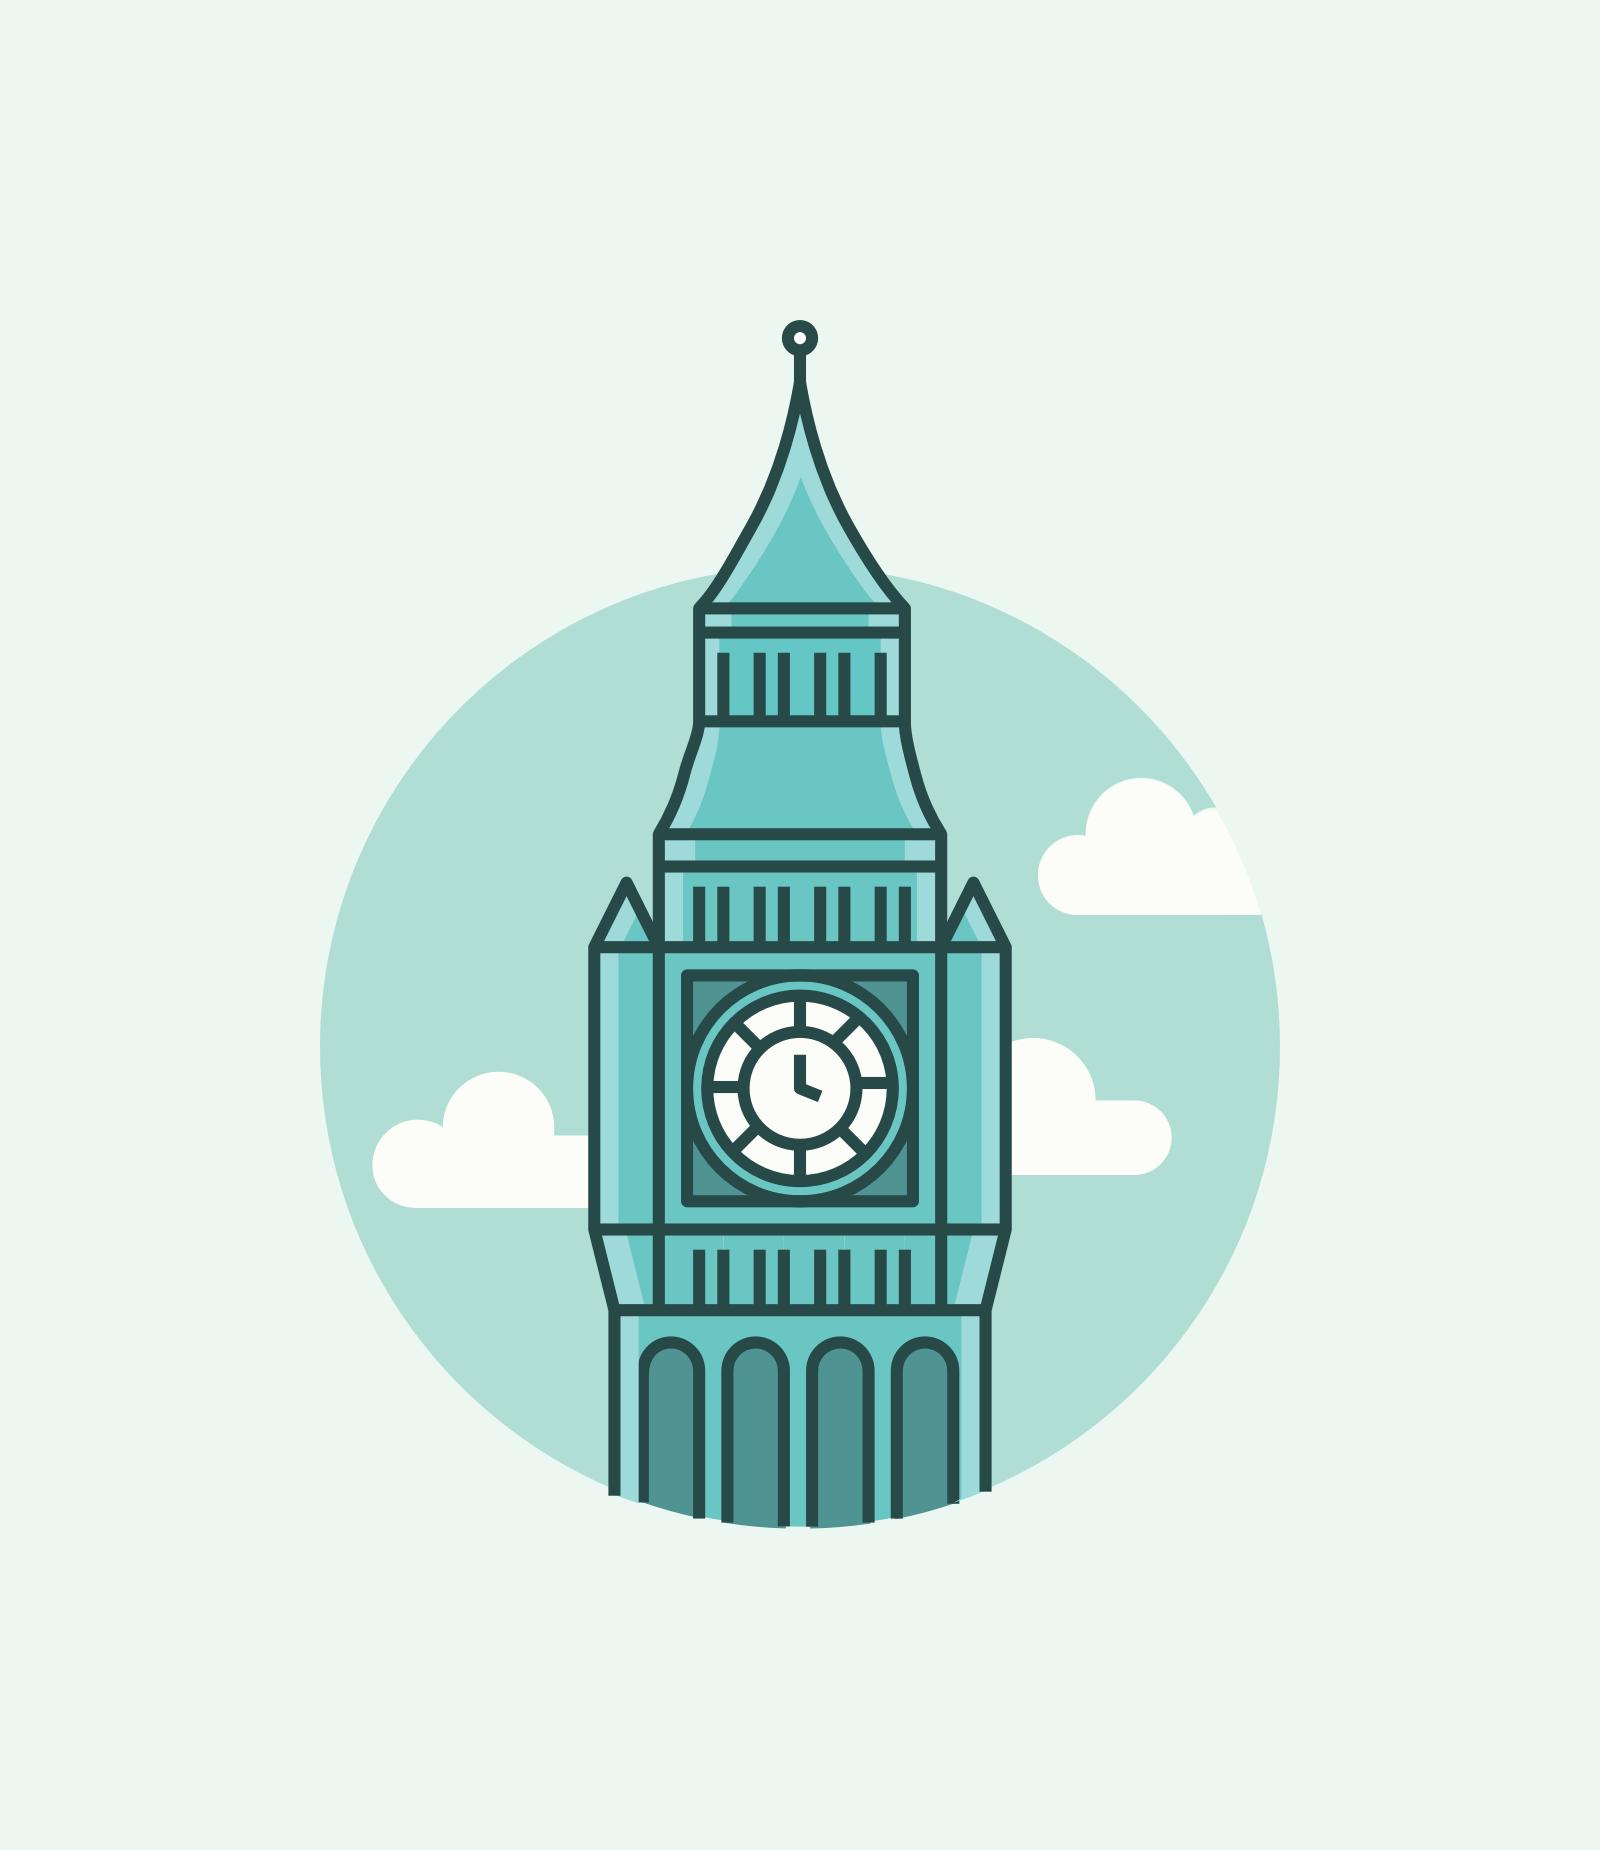 London City Illustration Uk Travel Free Download Iconos De Instagram Cosas Para Dibujar Dibujos Faciles